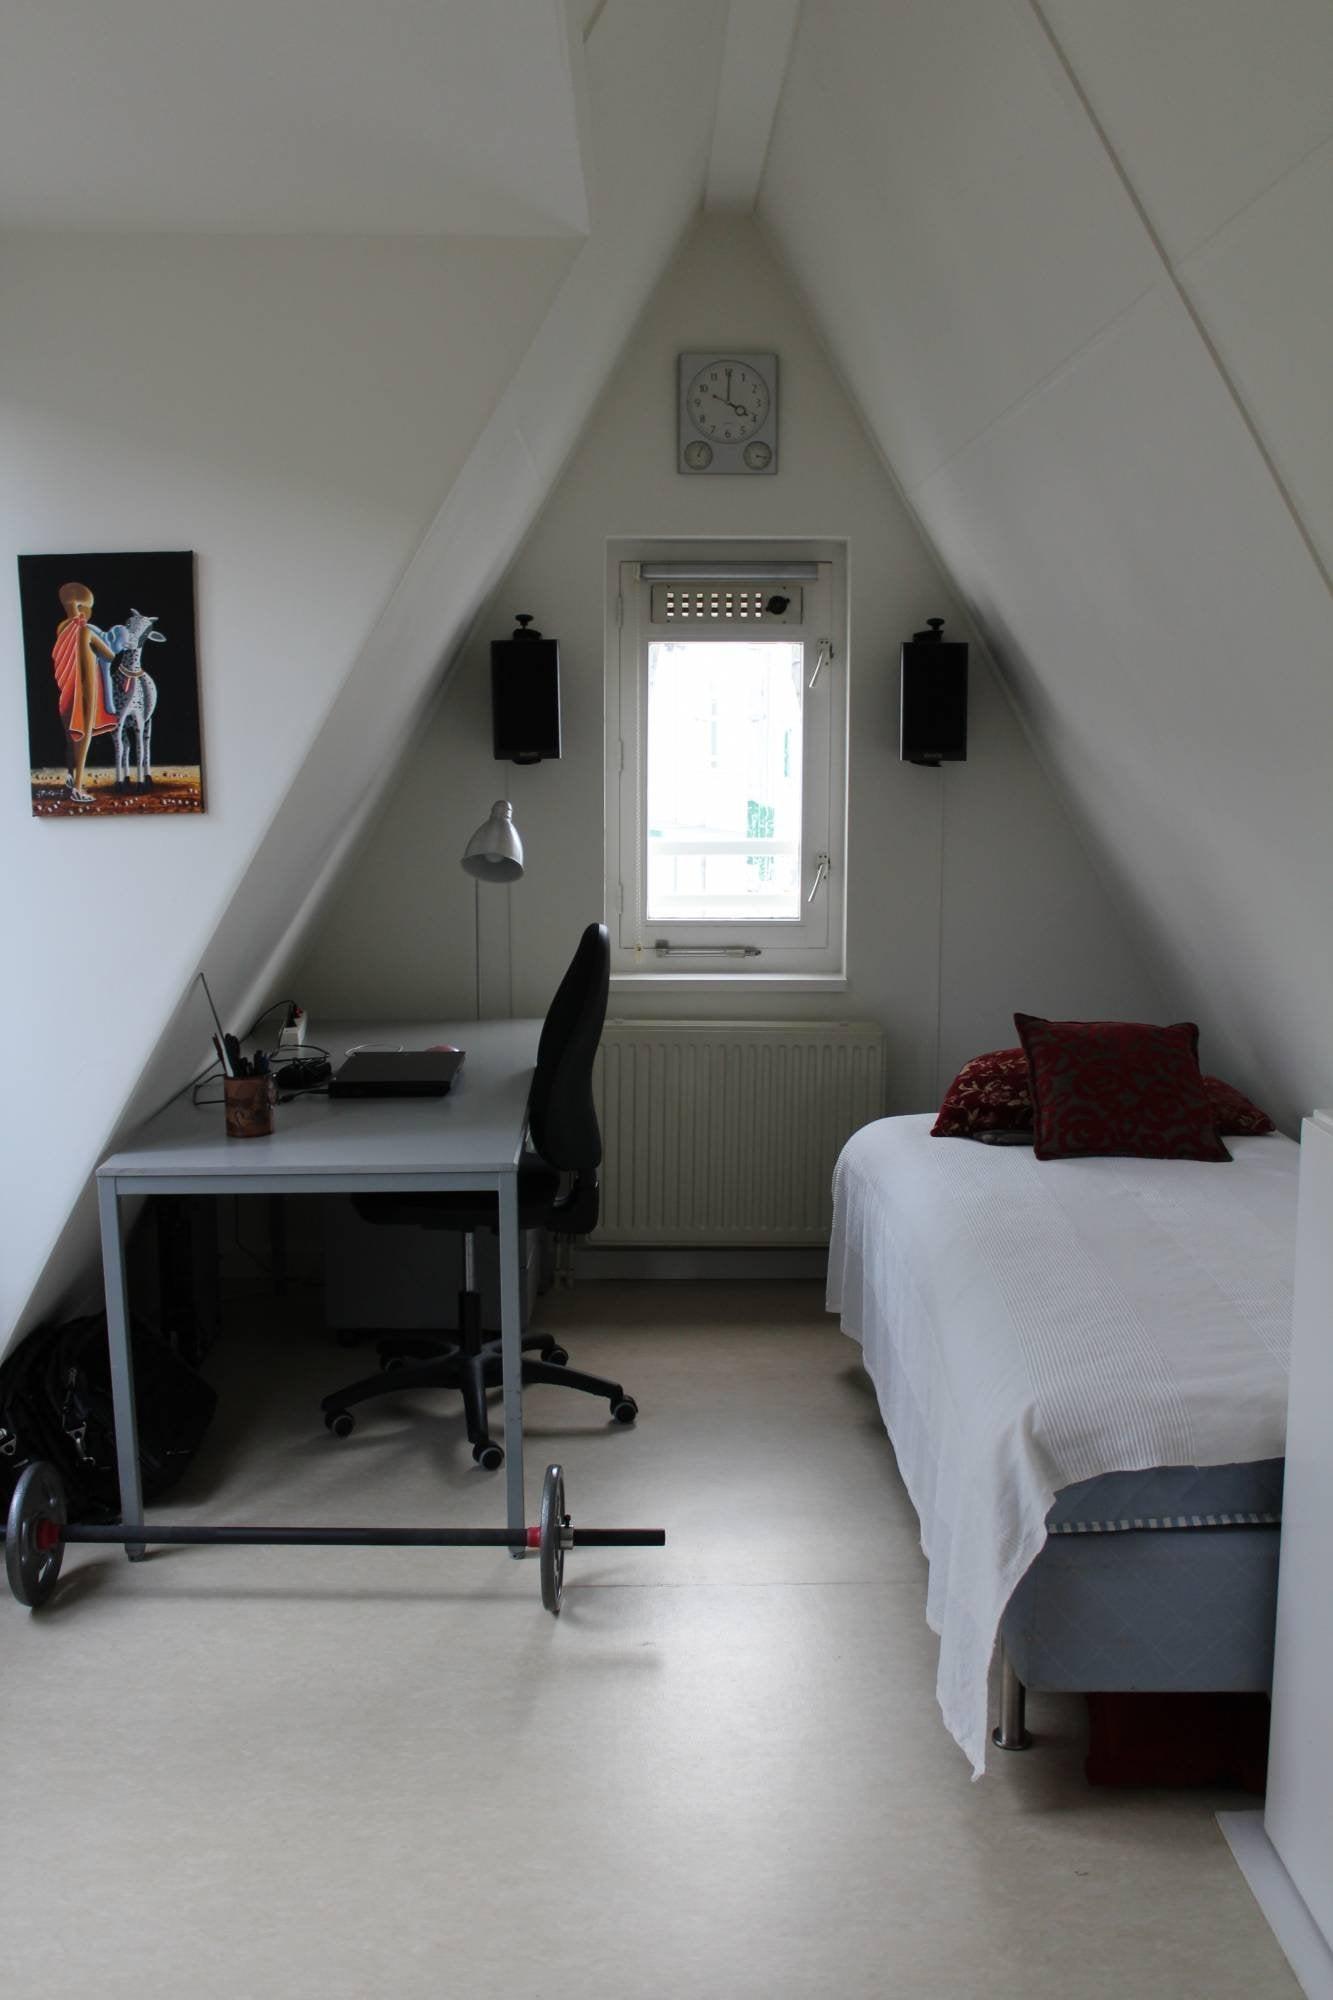 https://public.parariusoffice.nl/15/photos/huge/3513.1447858332-312.JPG